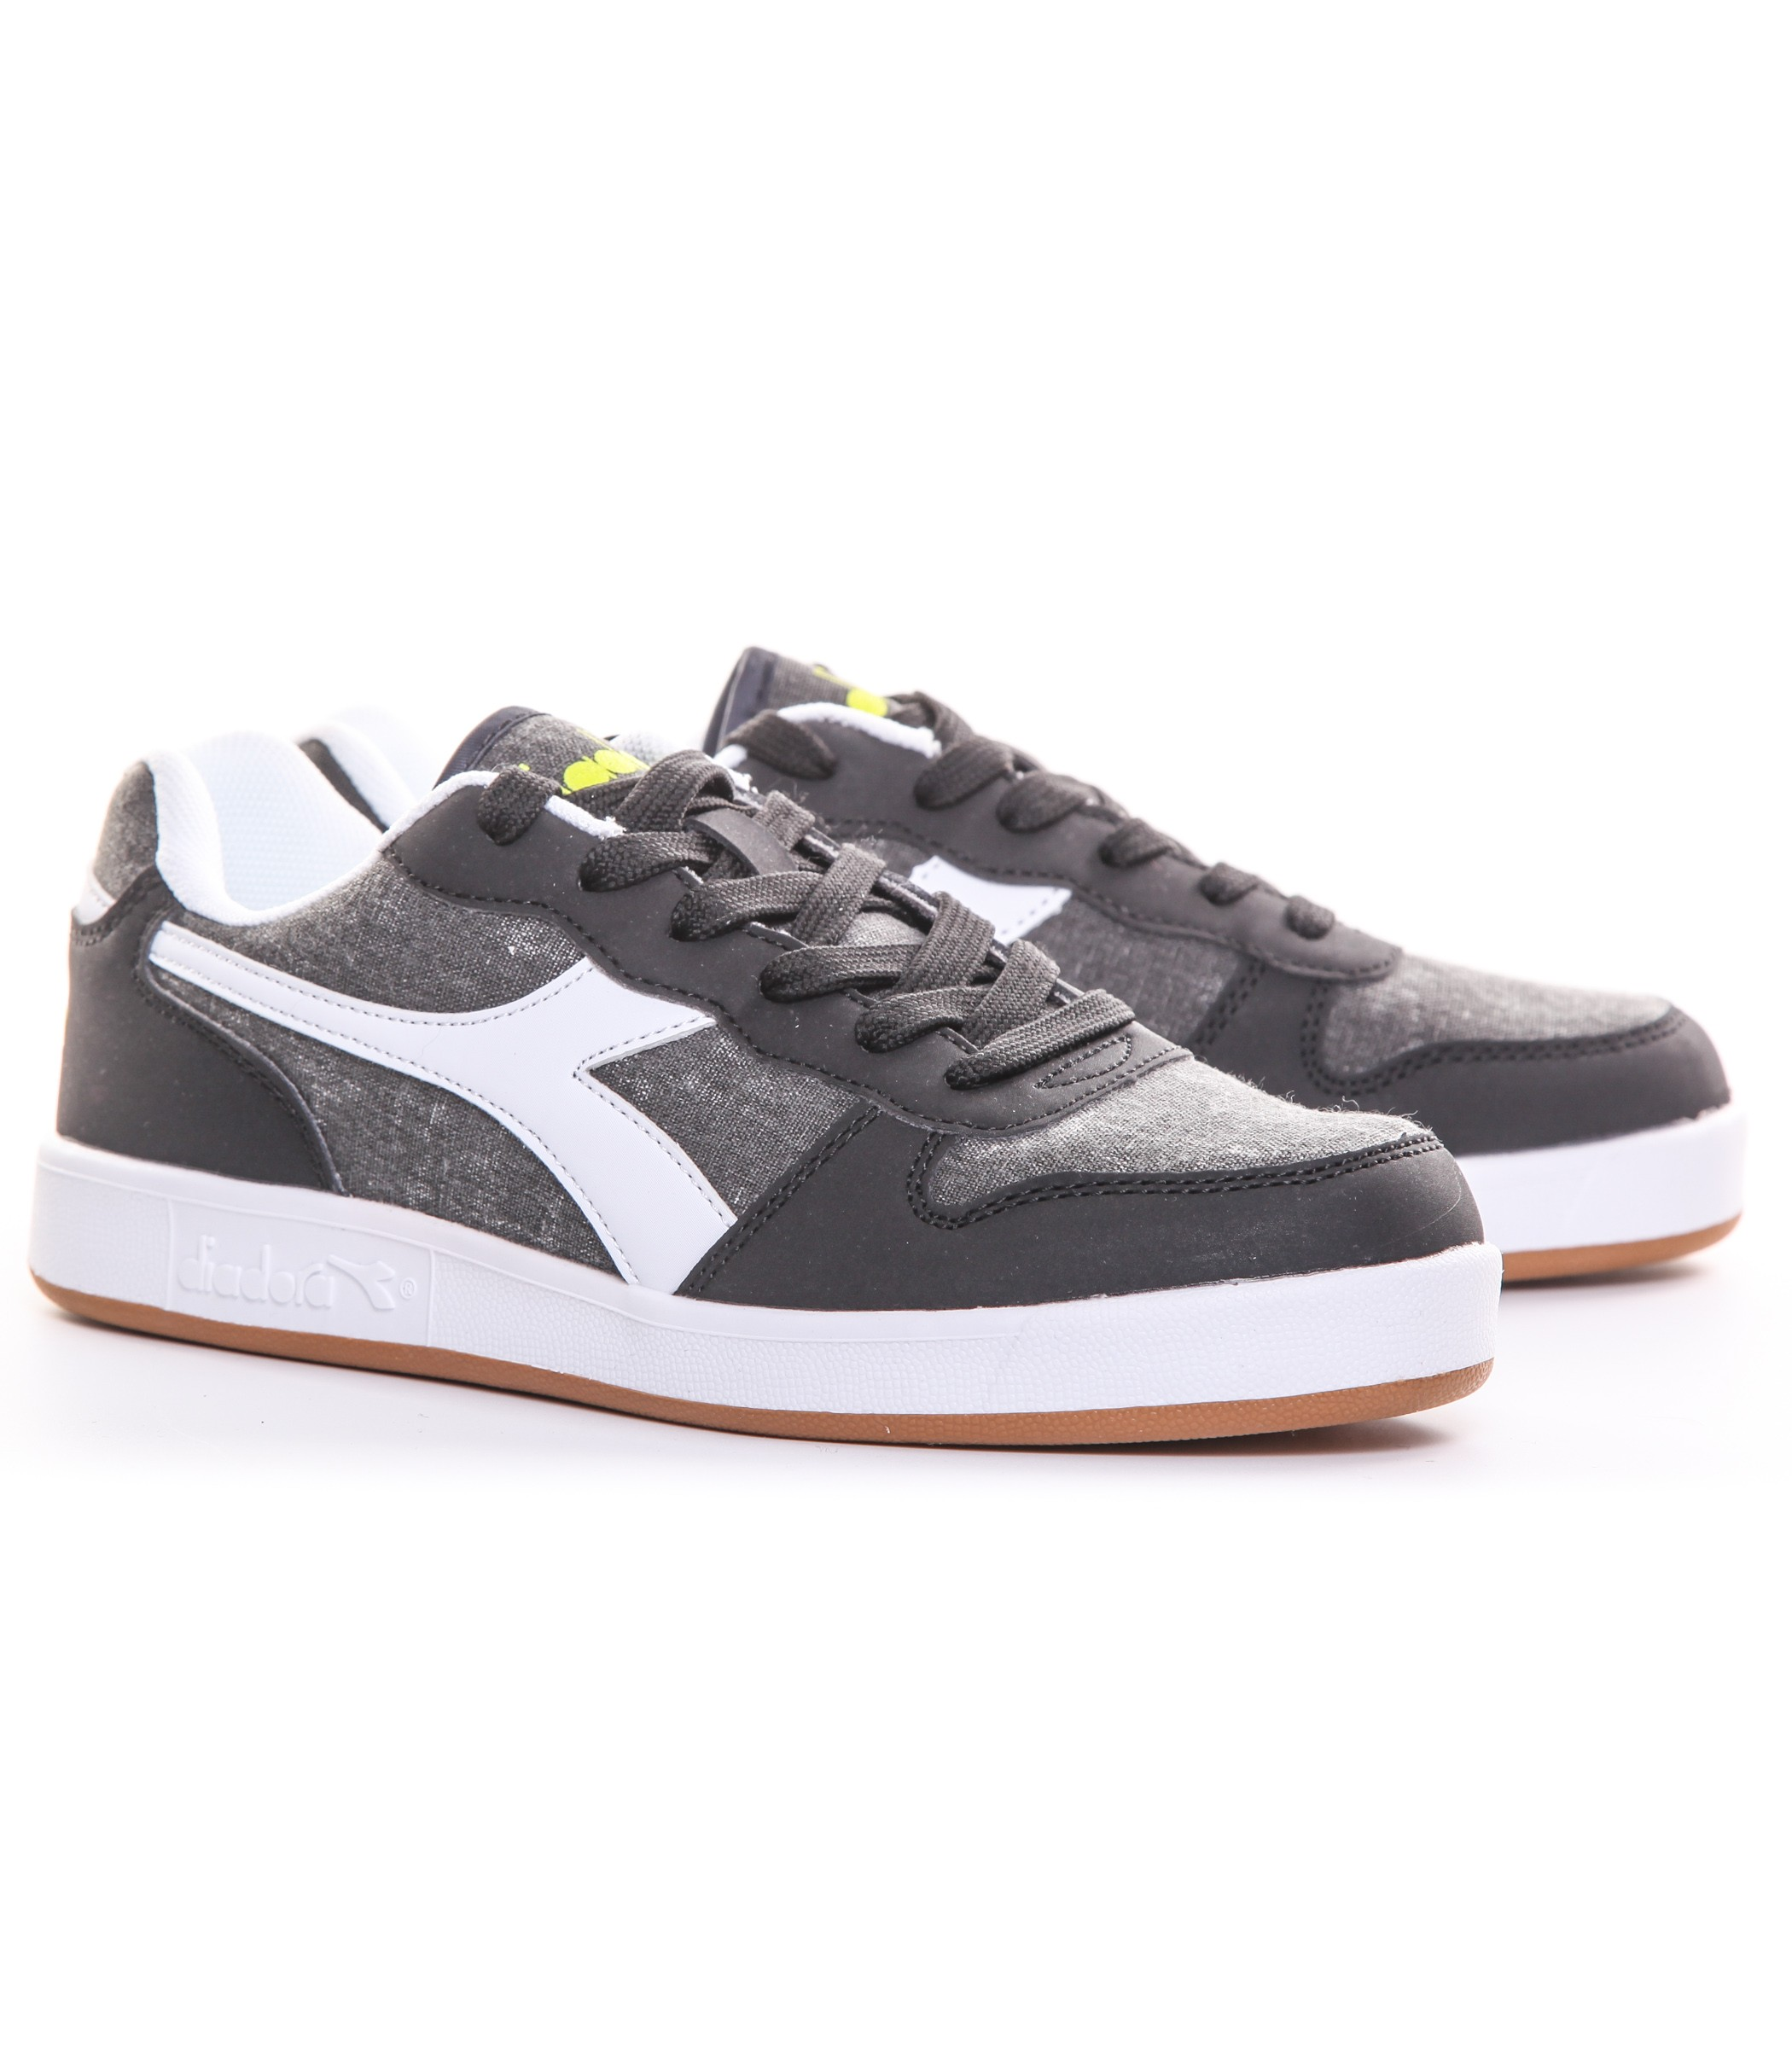 3eca1909ac337 Gs 173112 Rif Playground Ragazzi Scarpe Sneakers Unisex 101 Diadora Cv  qawAIx